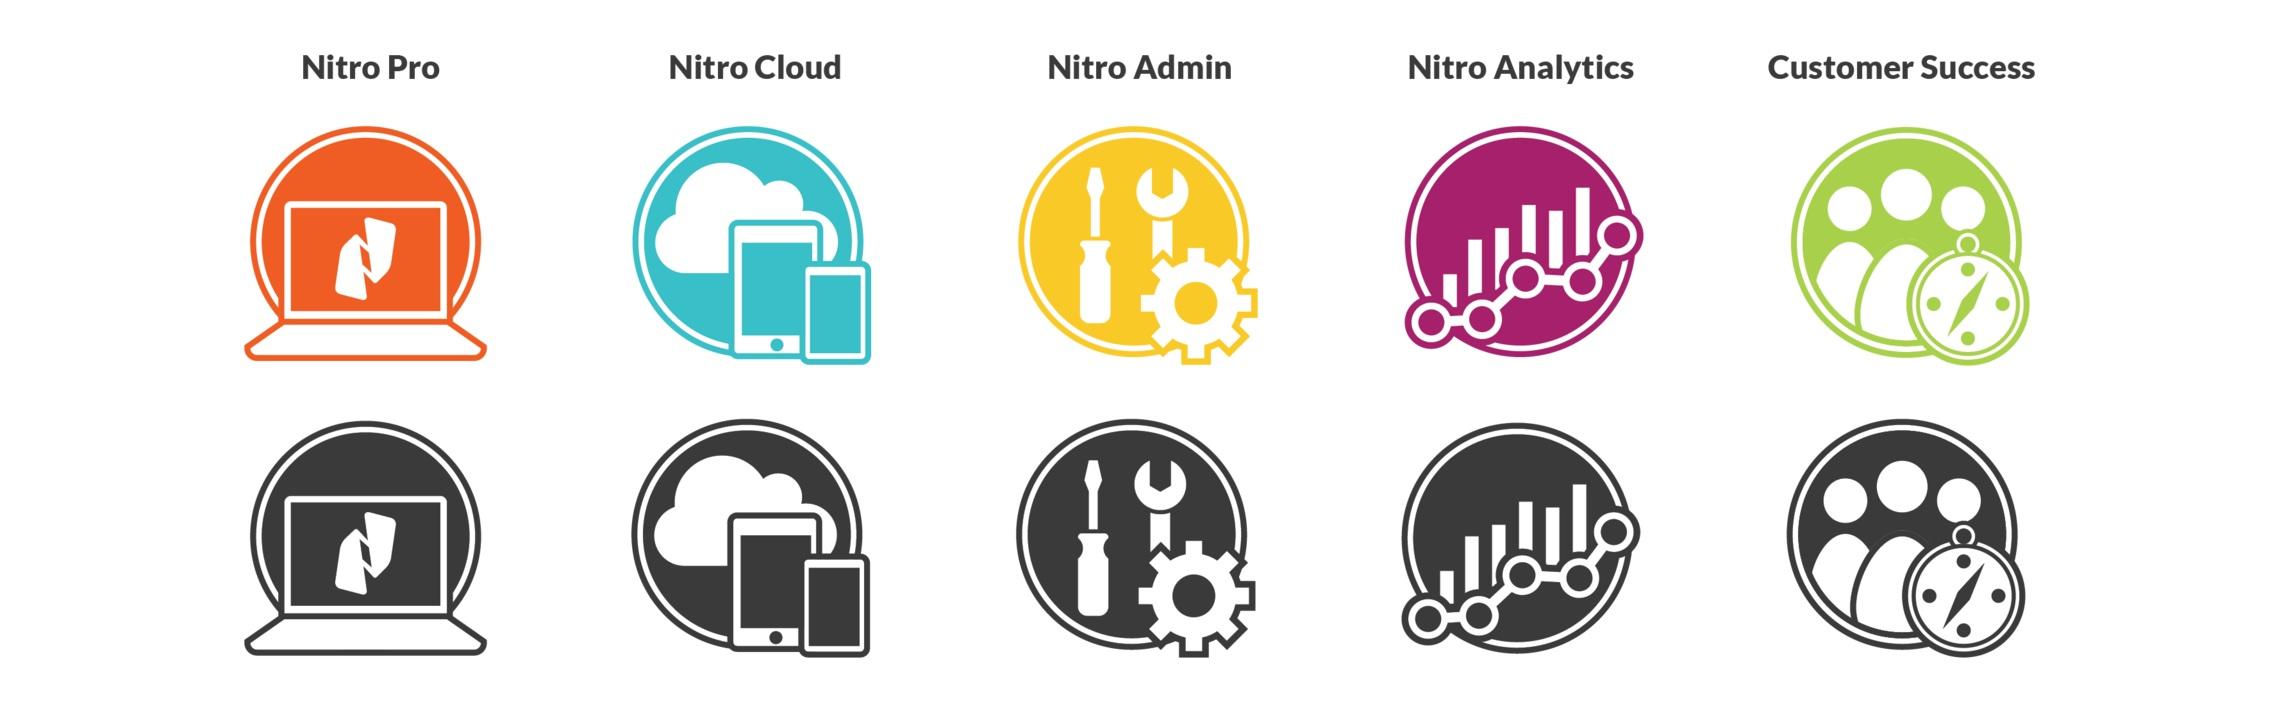 nps-icons.jpg